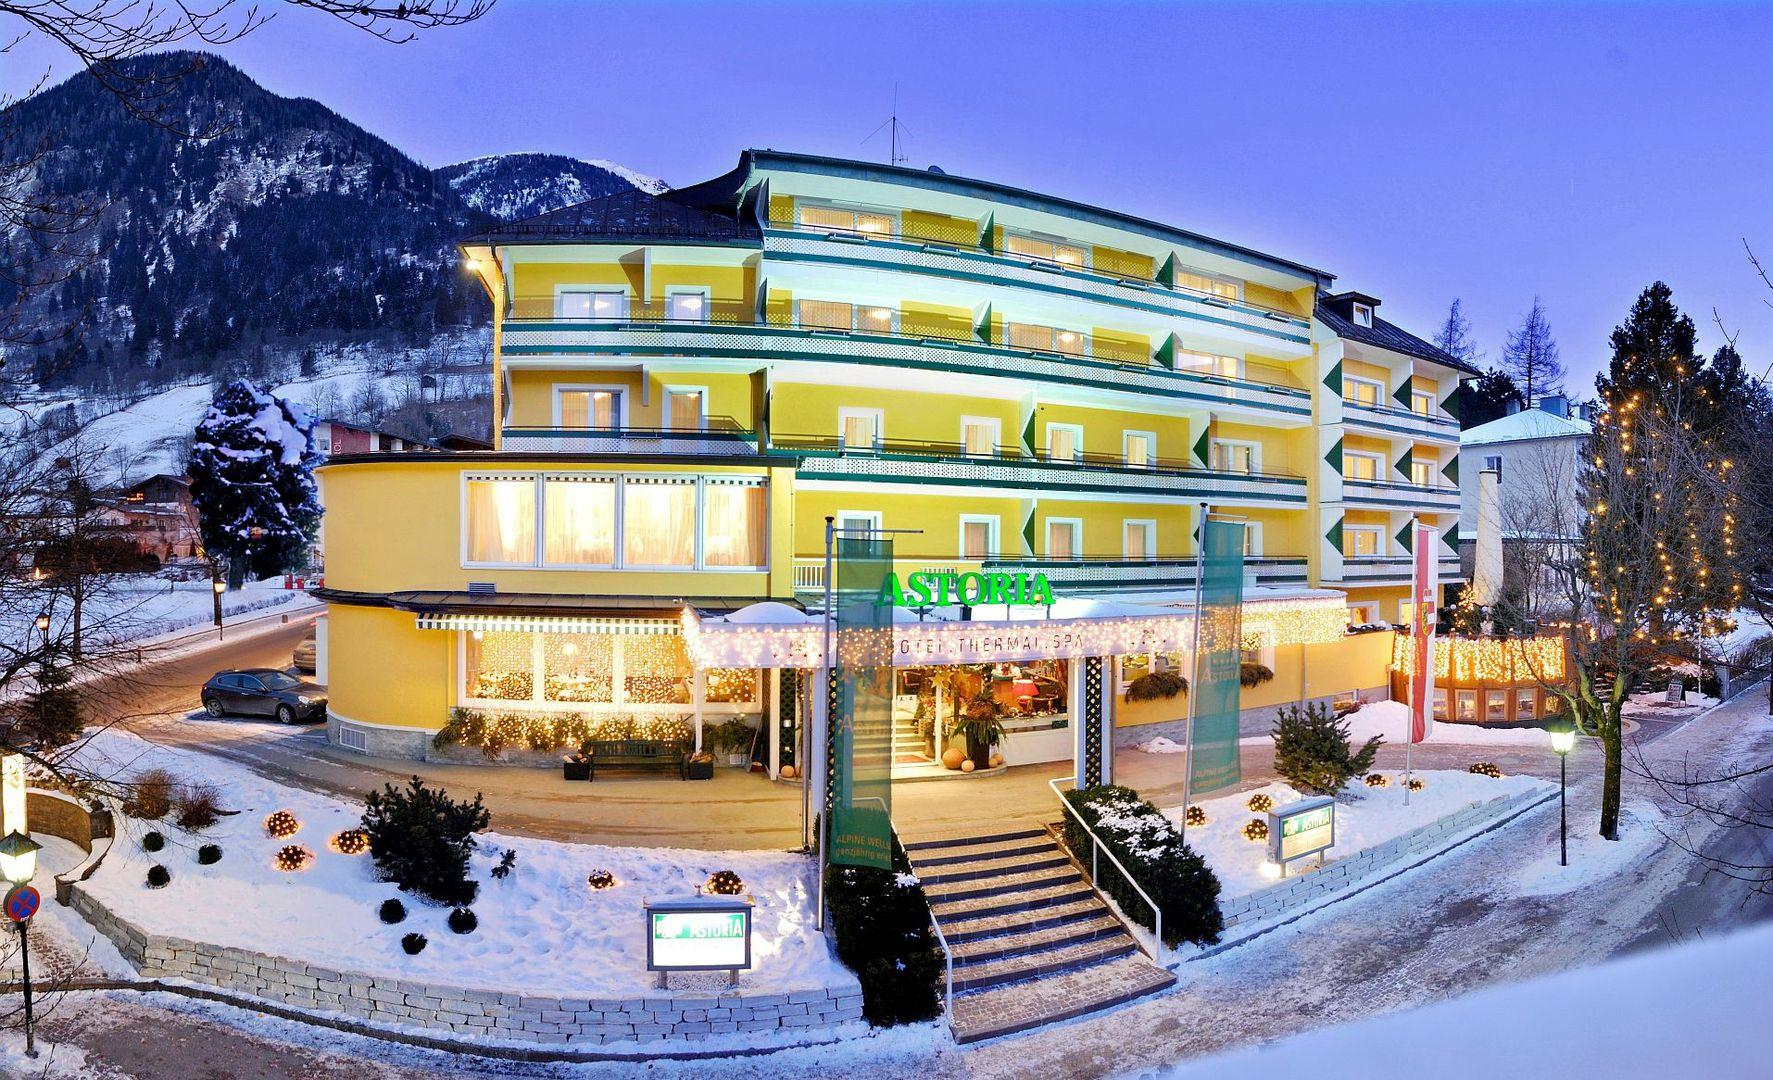 Hotel Astoria - Slide 1